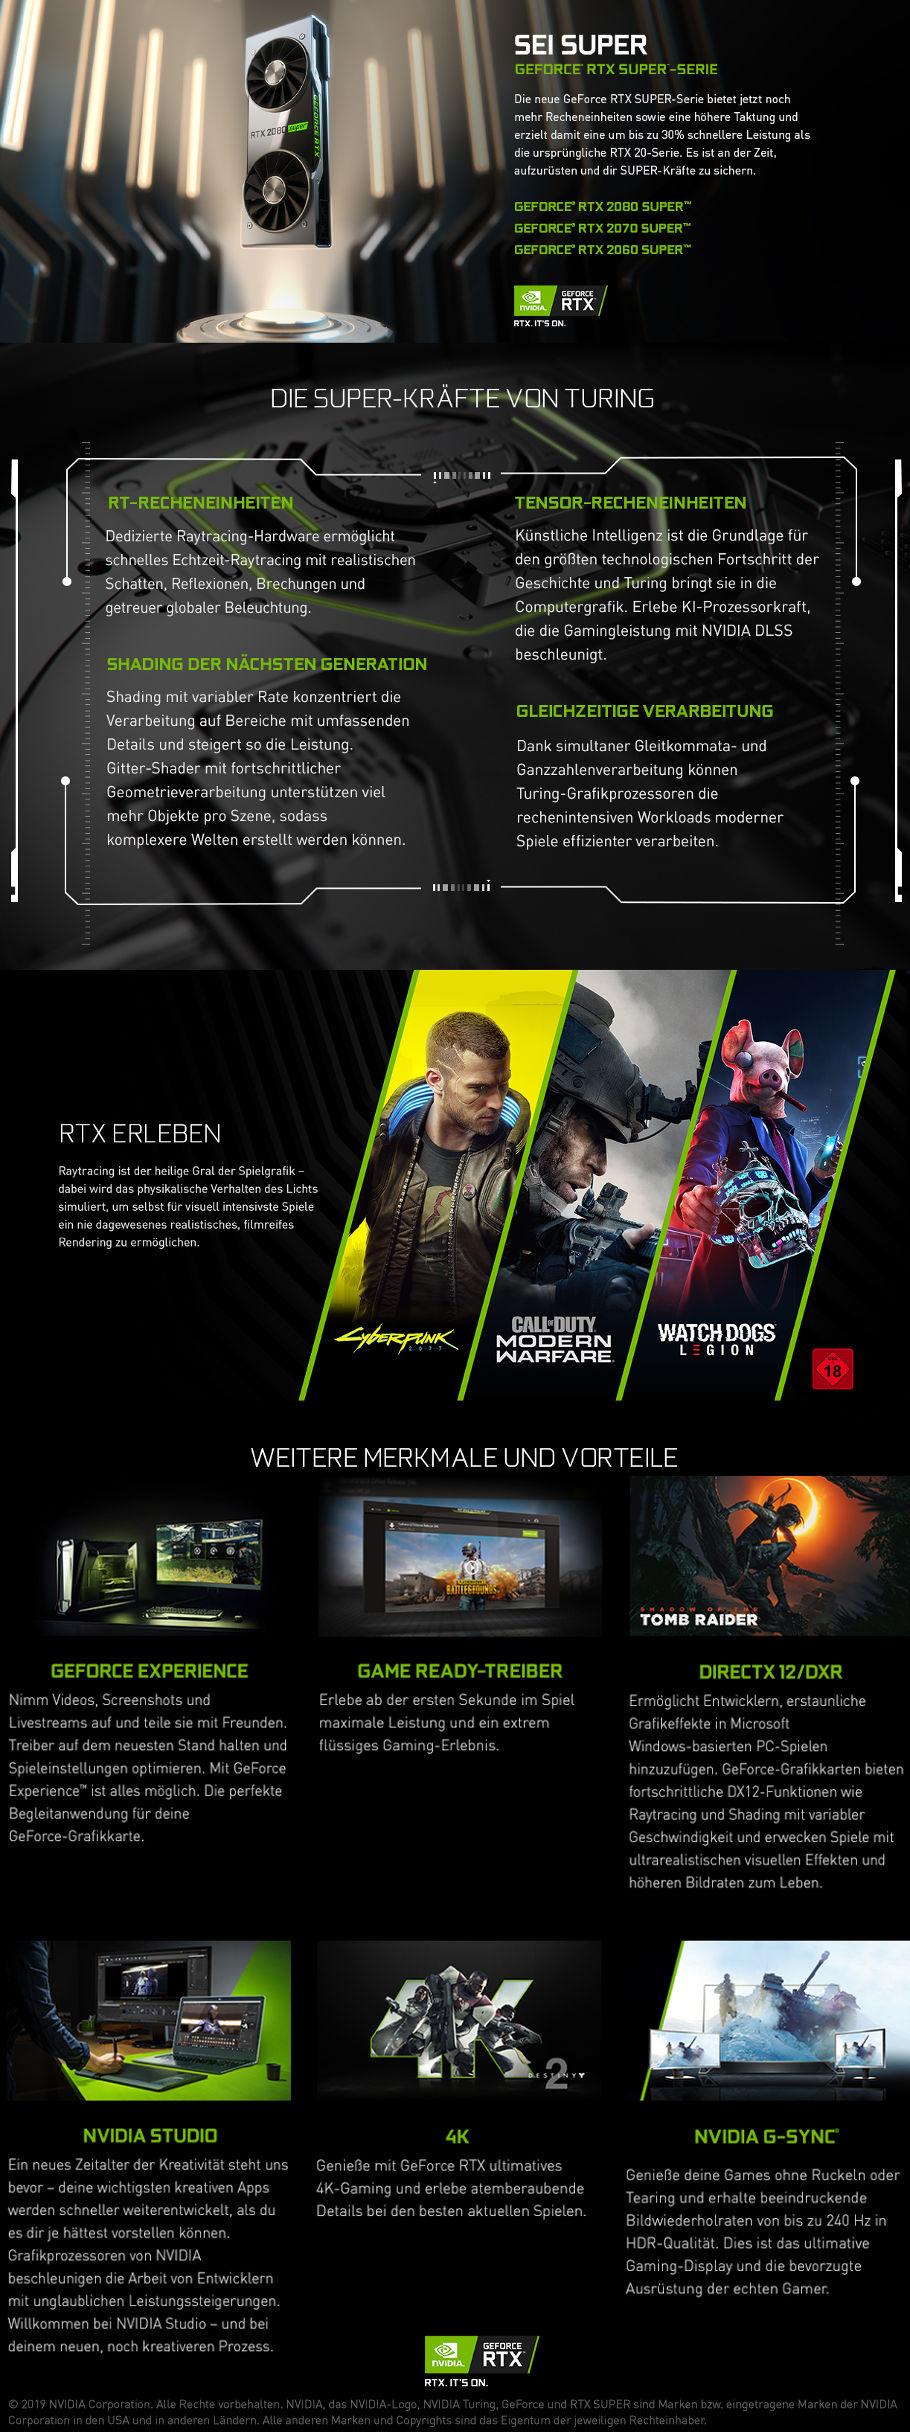 Die neuen Gamer PC mit NVIDIA RTX SUPER Grafikkarten